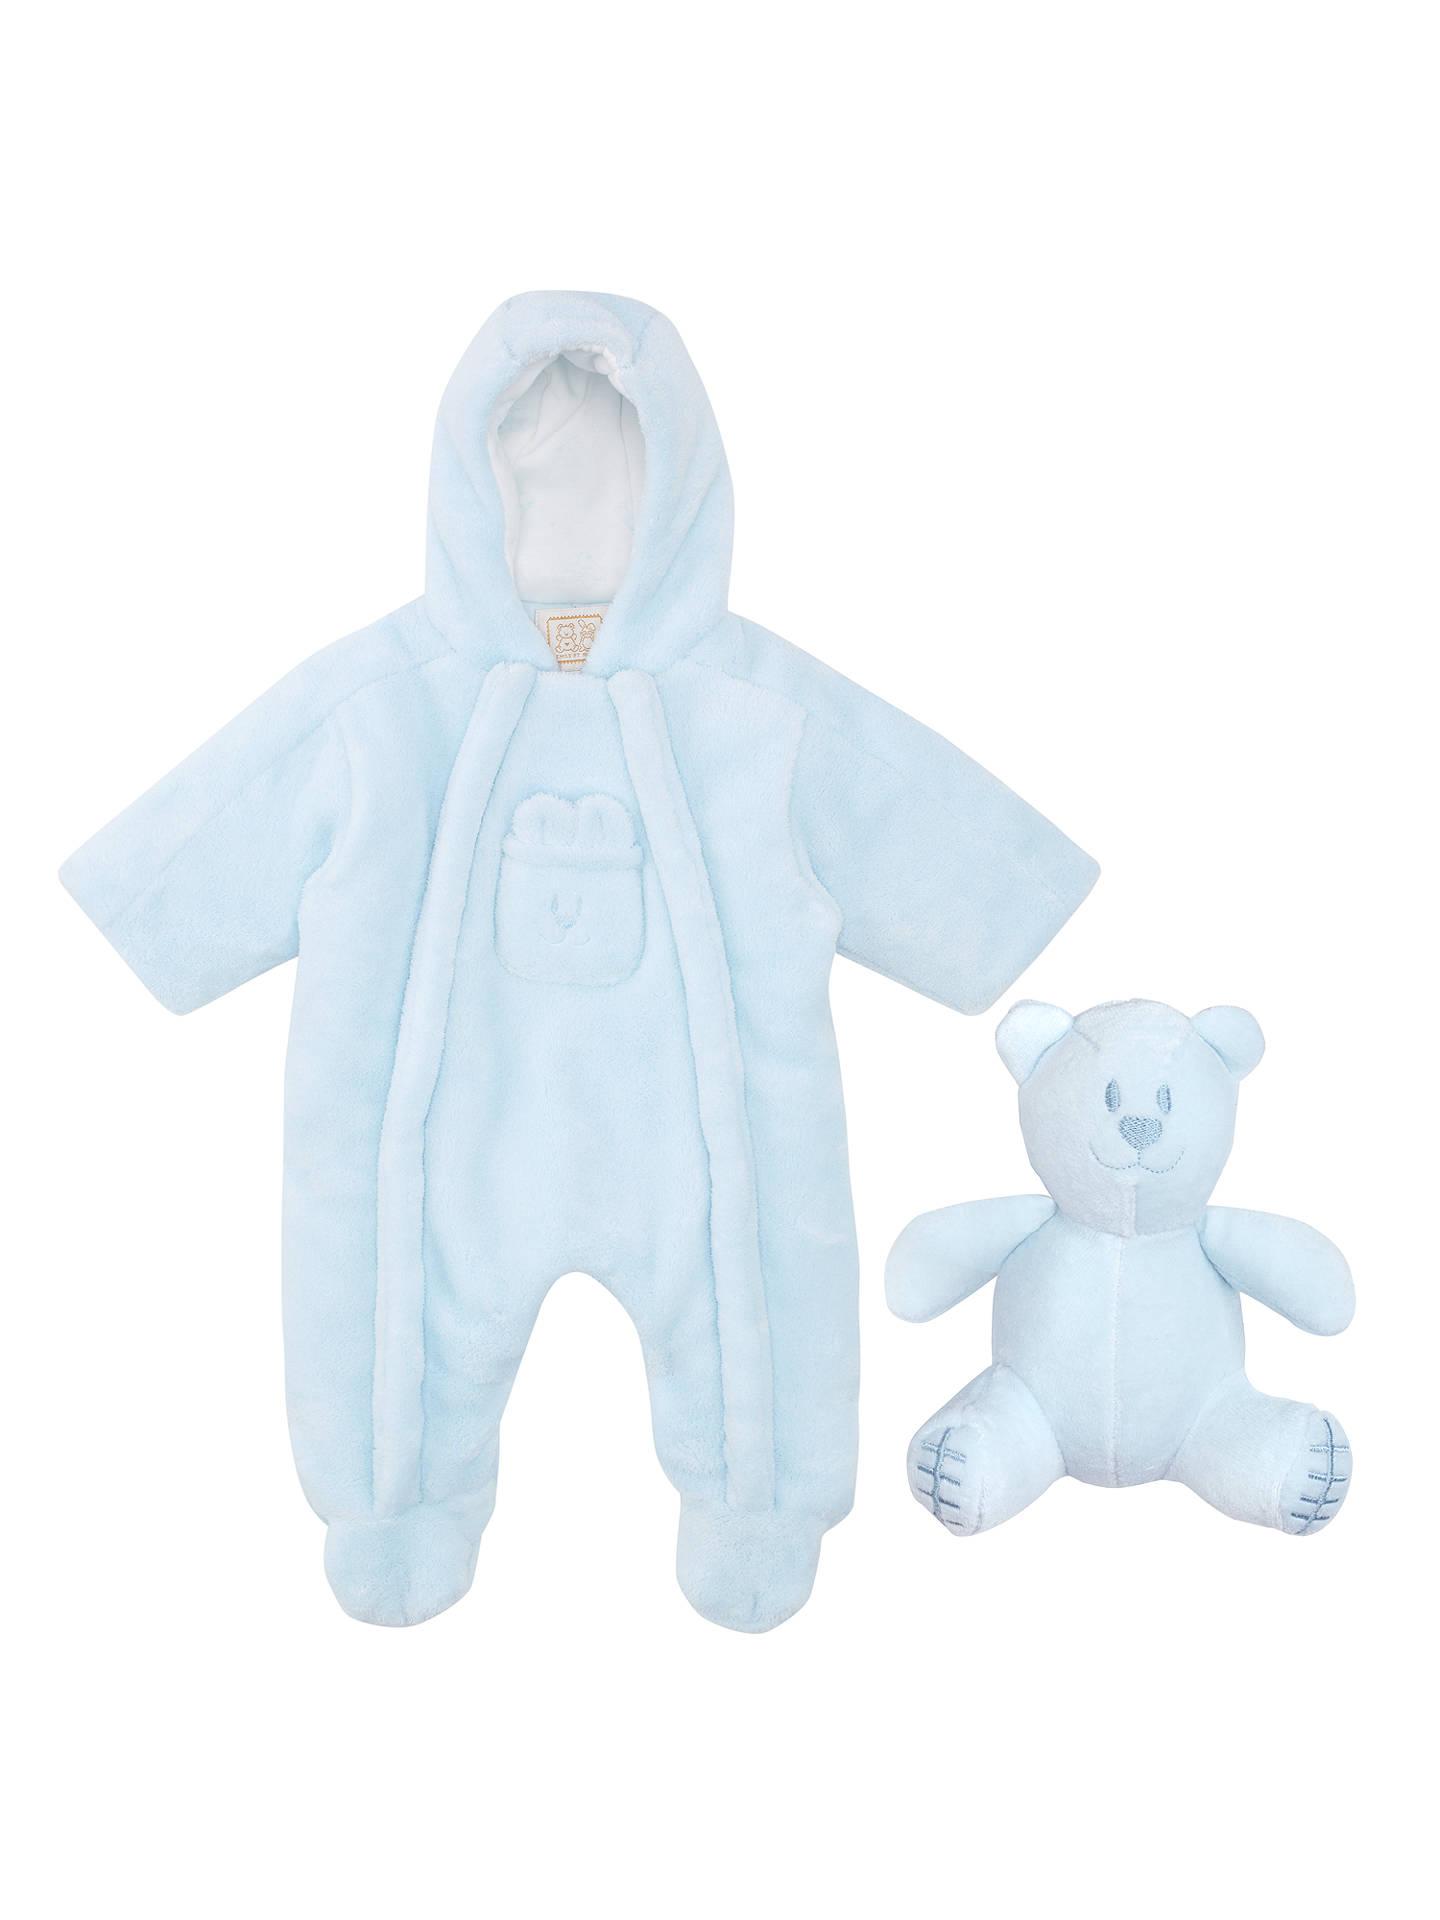 404fdb377 Buy Emile et Rose Baby Fleece Pramsuit, Blue, Newborn Online at  johnlewis.com ...